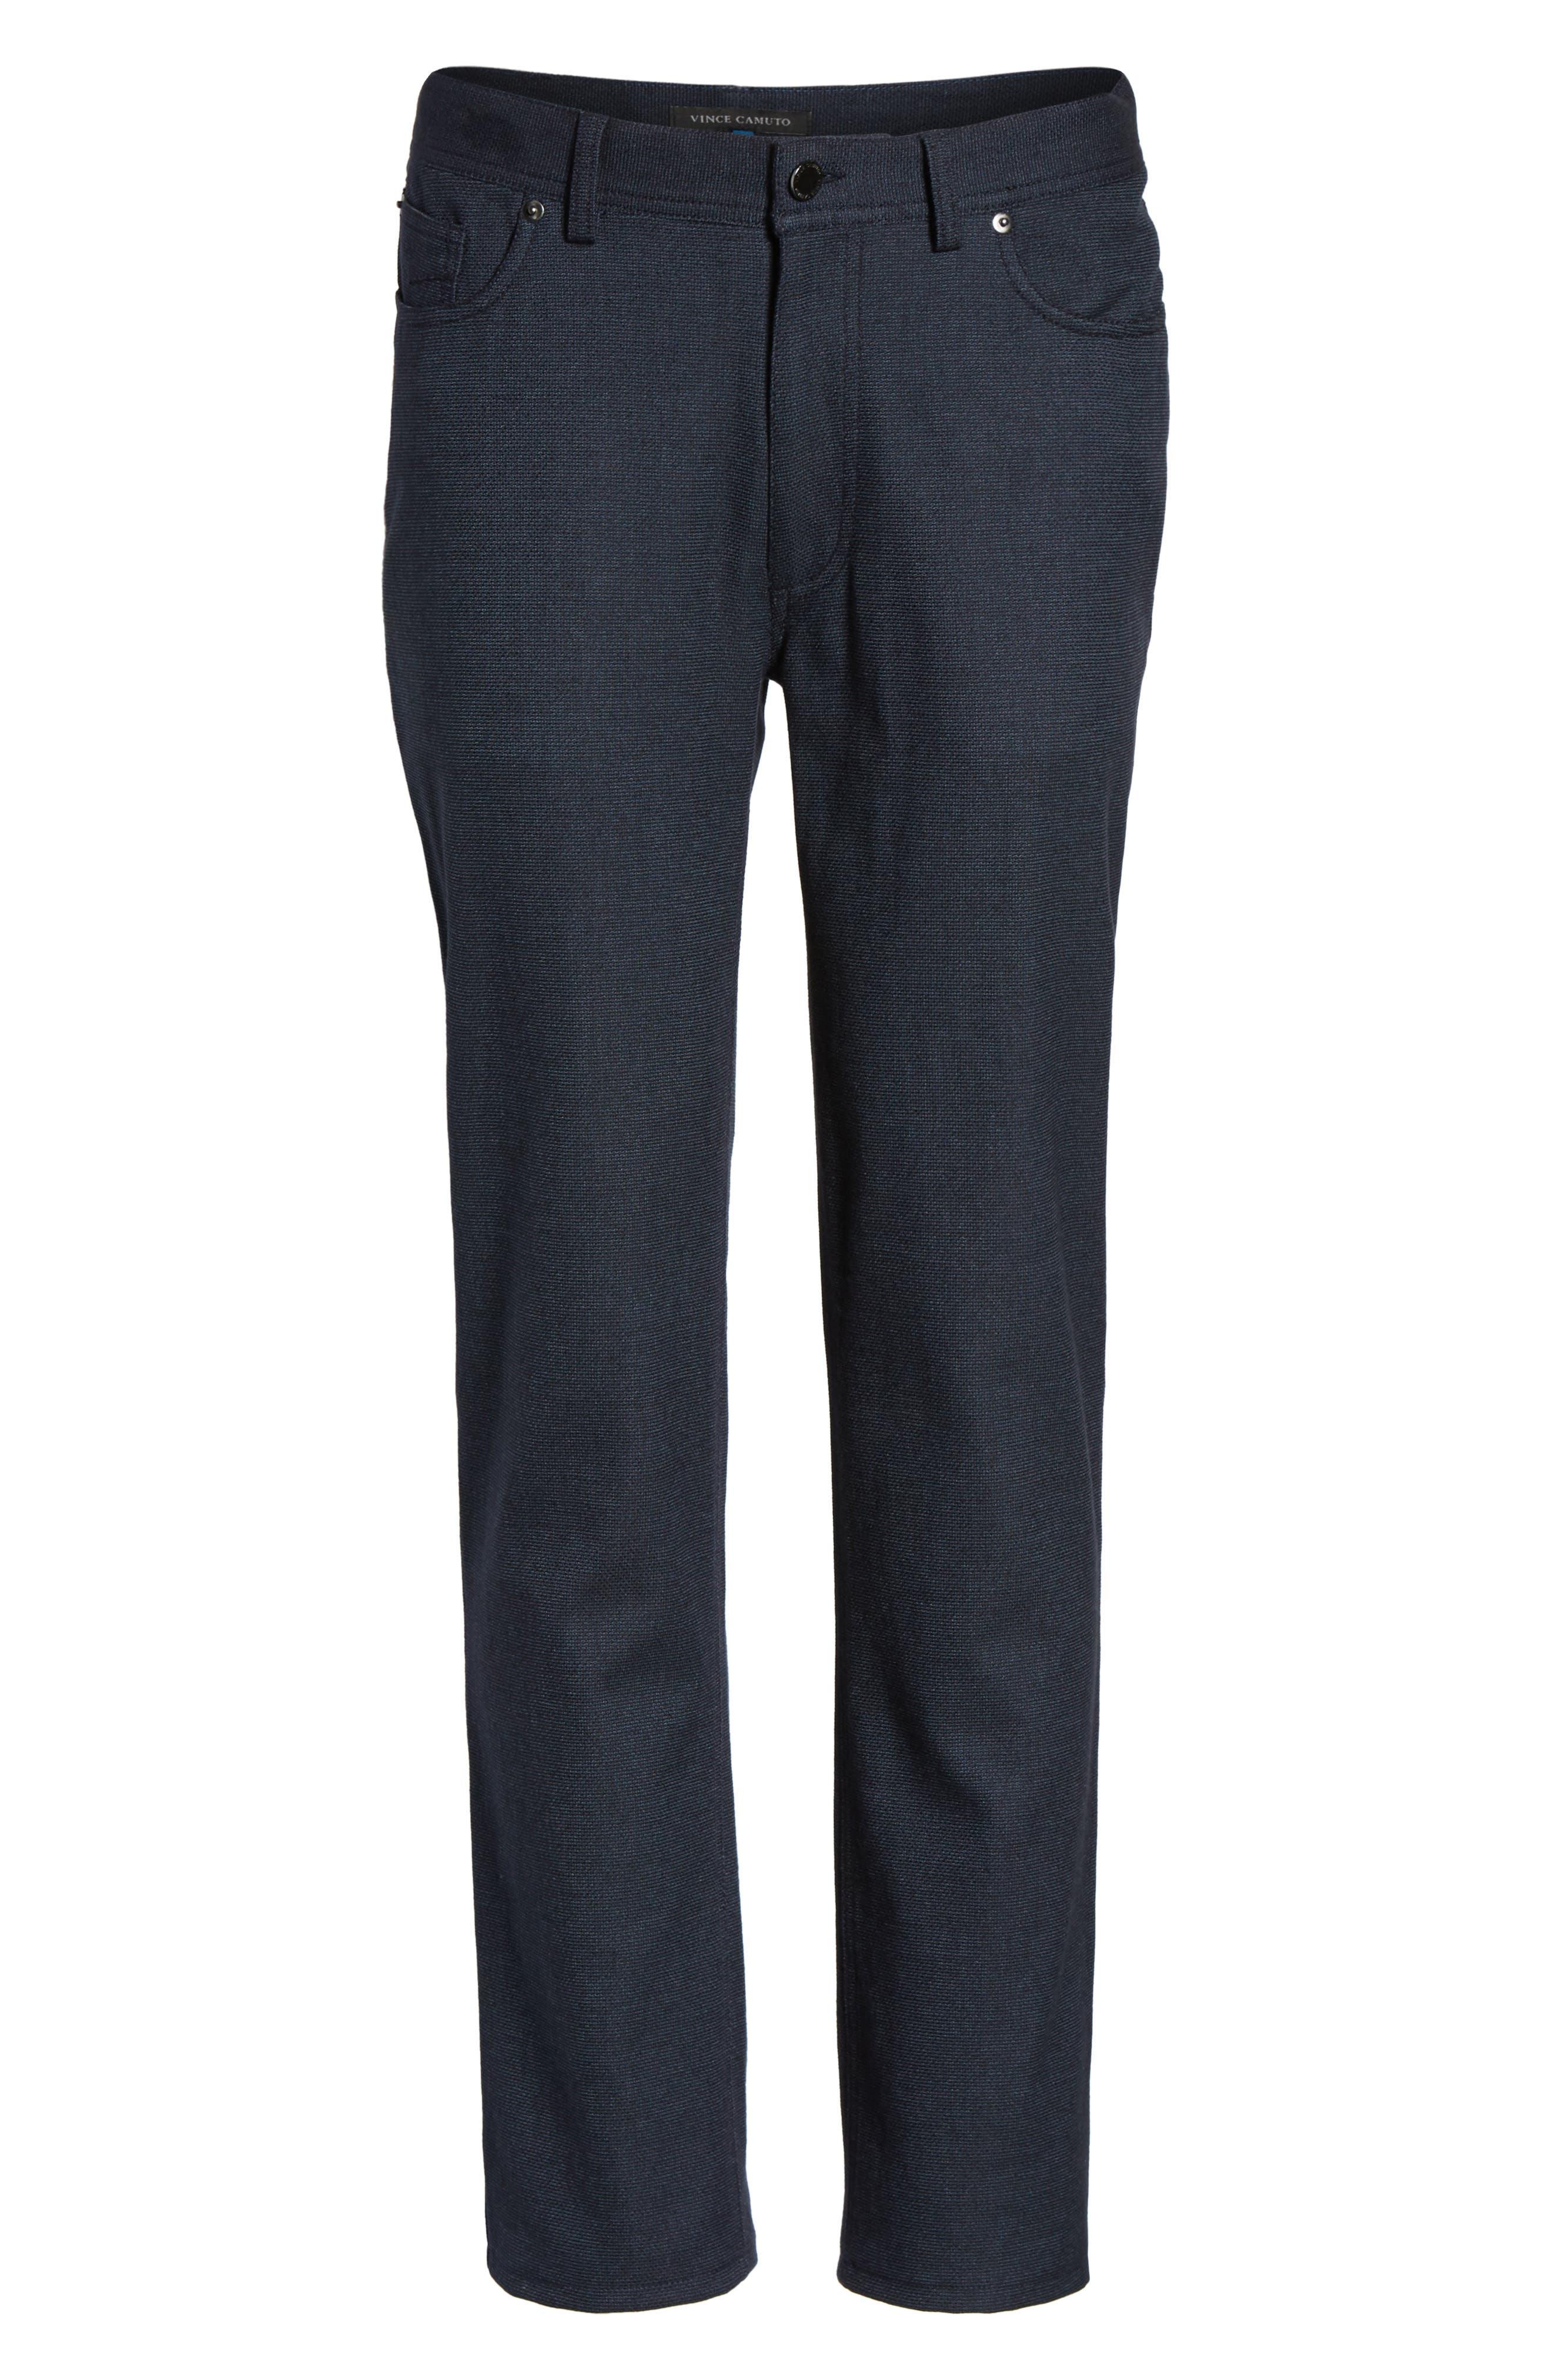 Vince Slim Fit Stretch Five-Pocket Pants,                             Alternate thumbnail 5, color,                             Navy Digital Neat